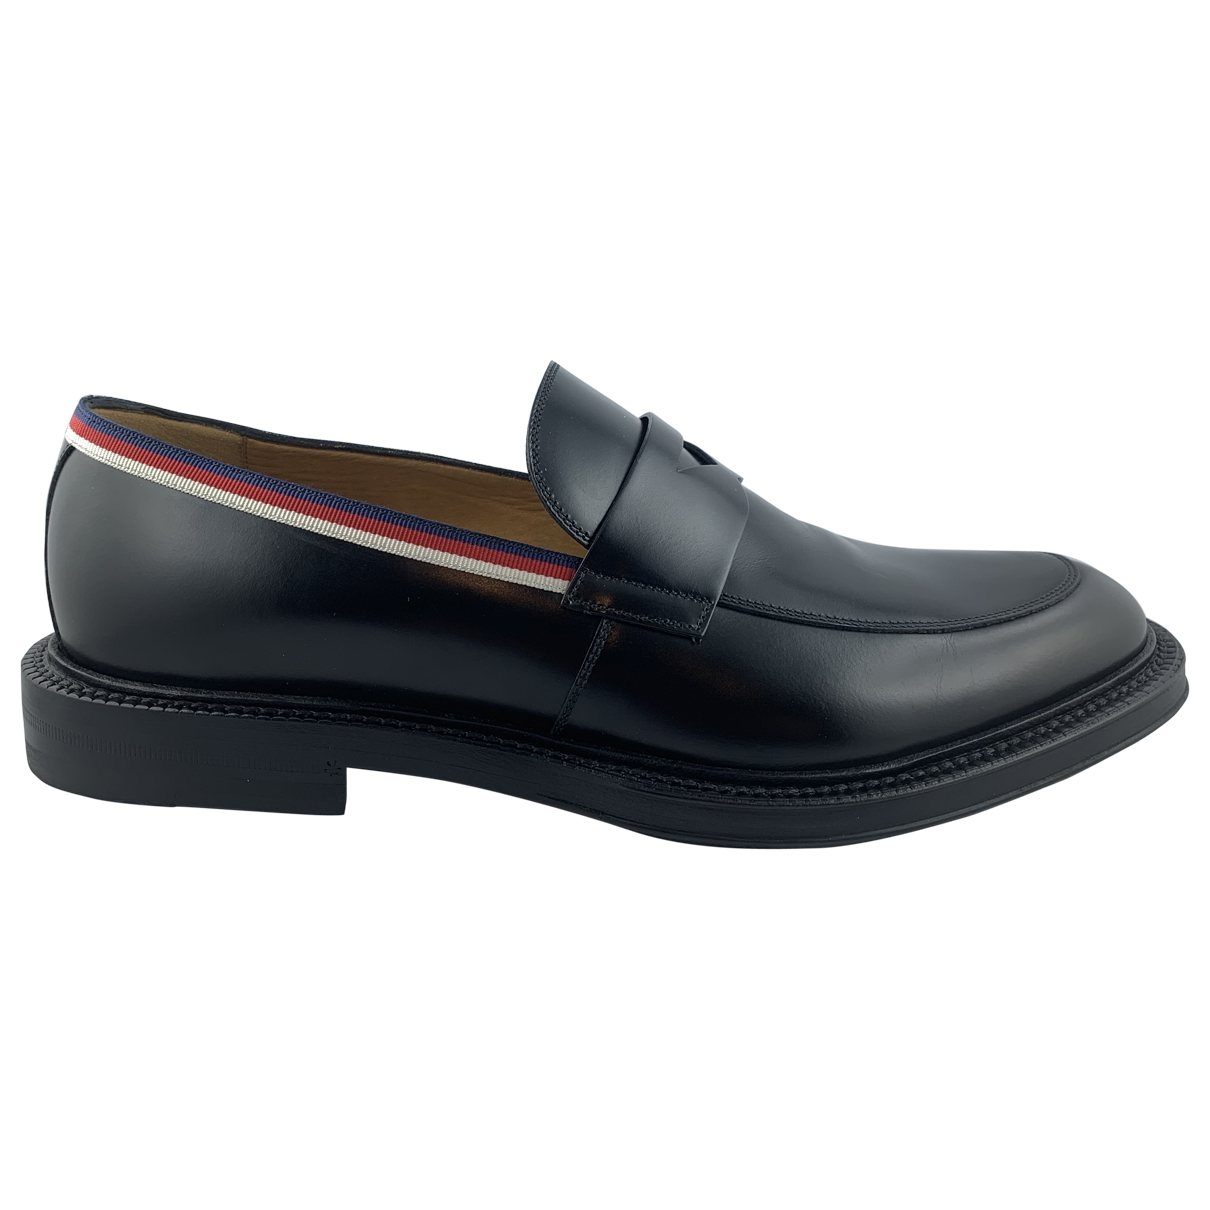 Gucci \N Black Leather Lace ups for Men 42.5 EU